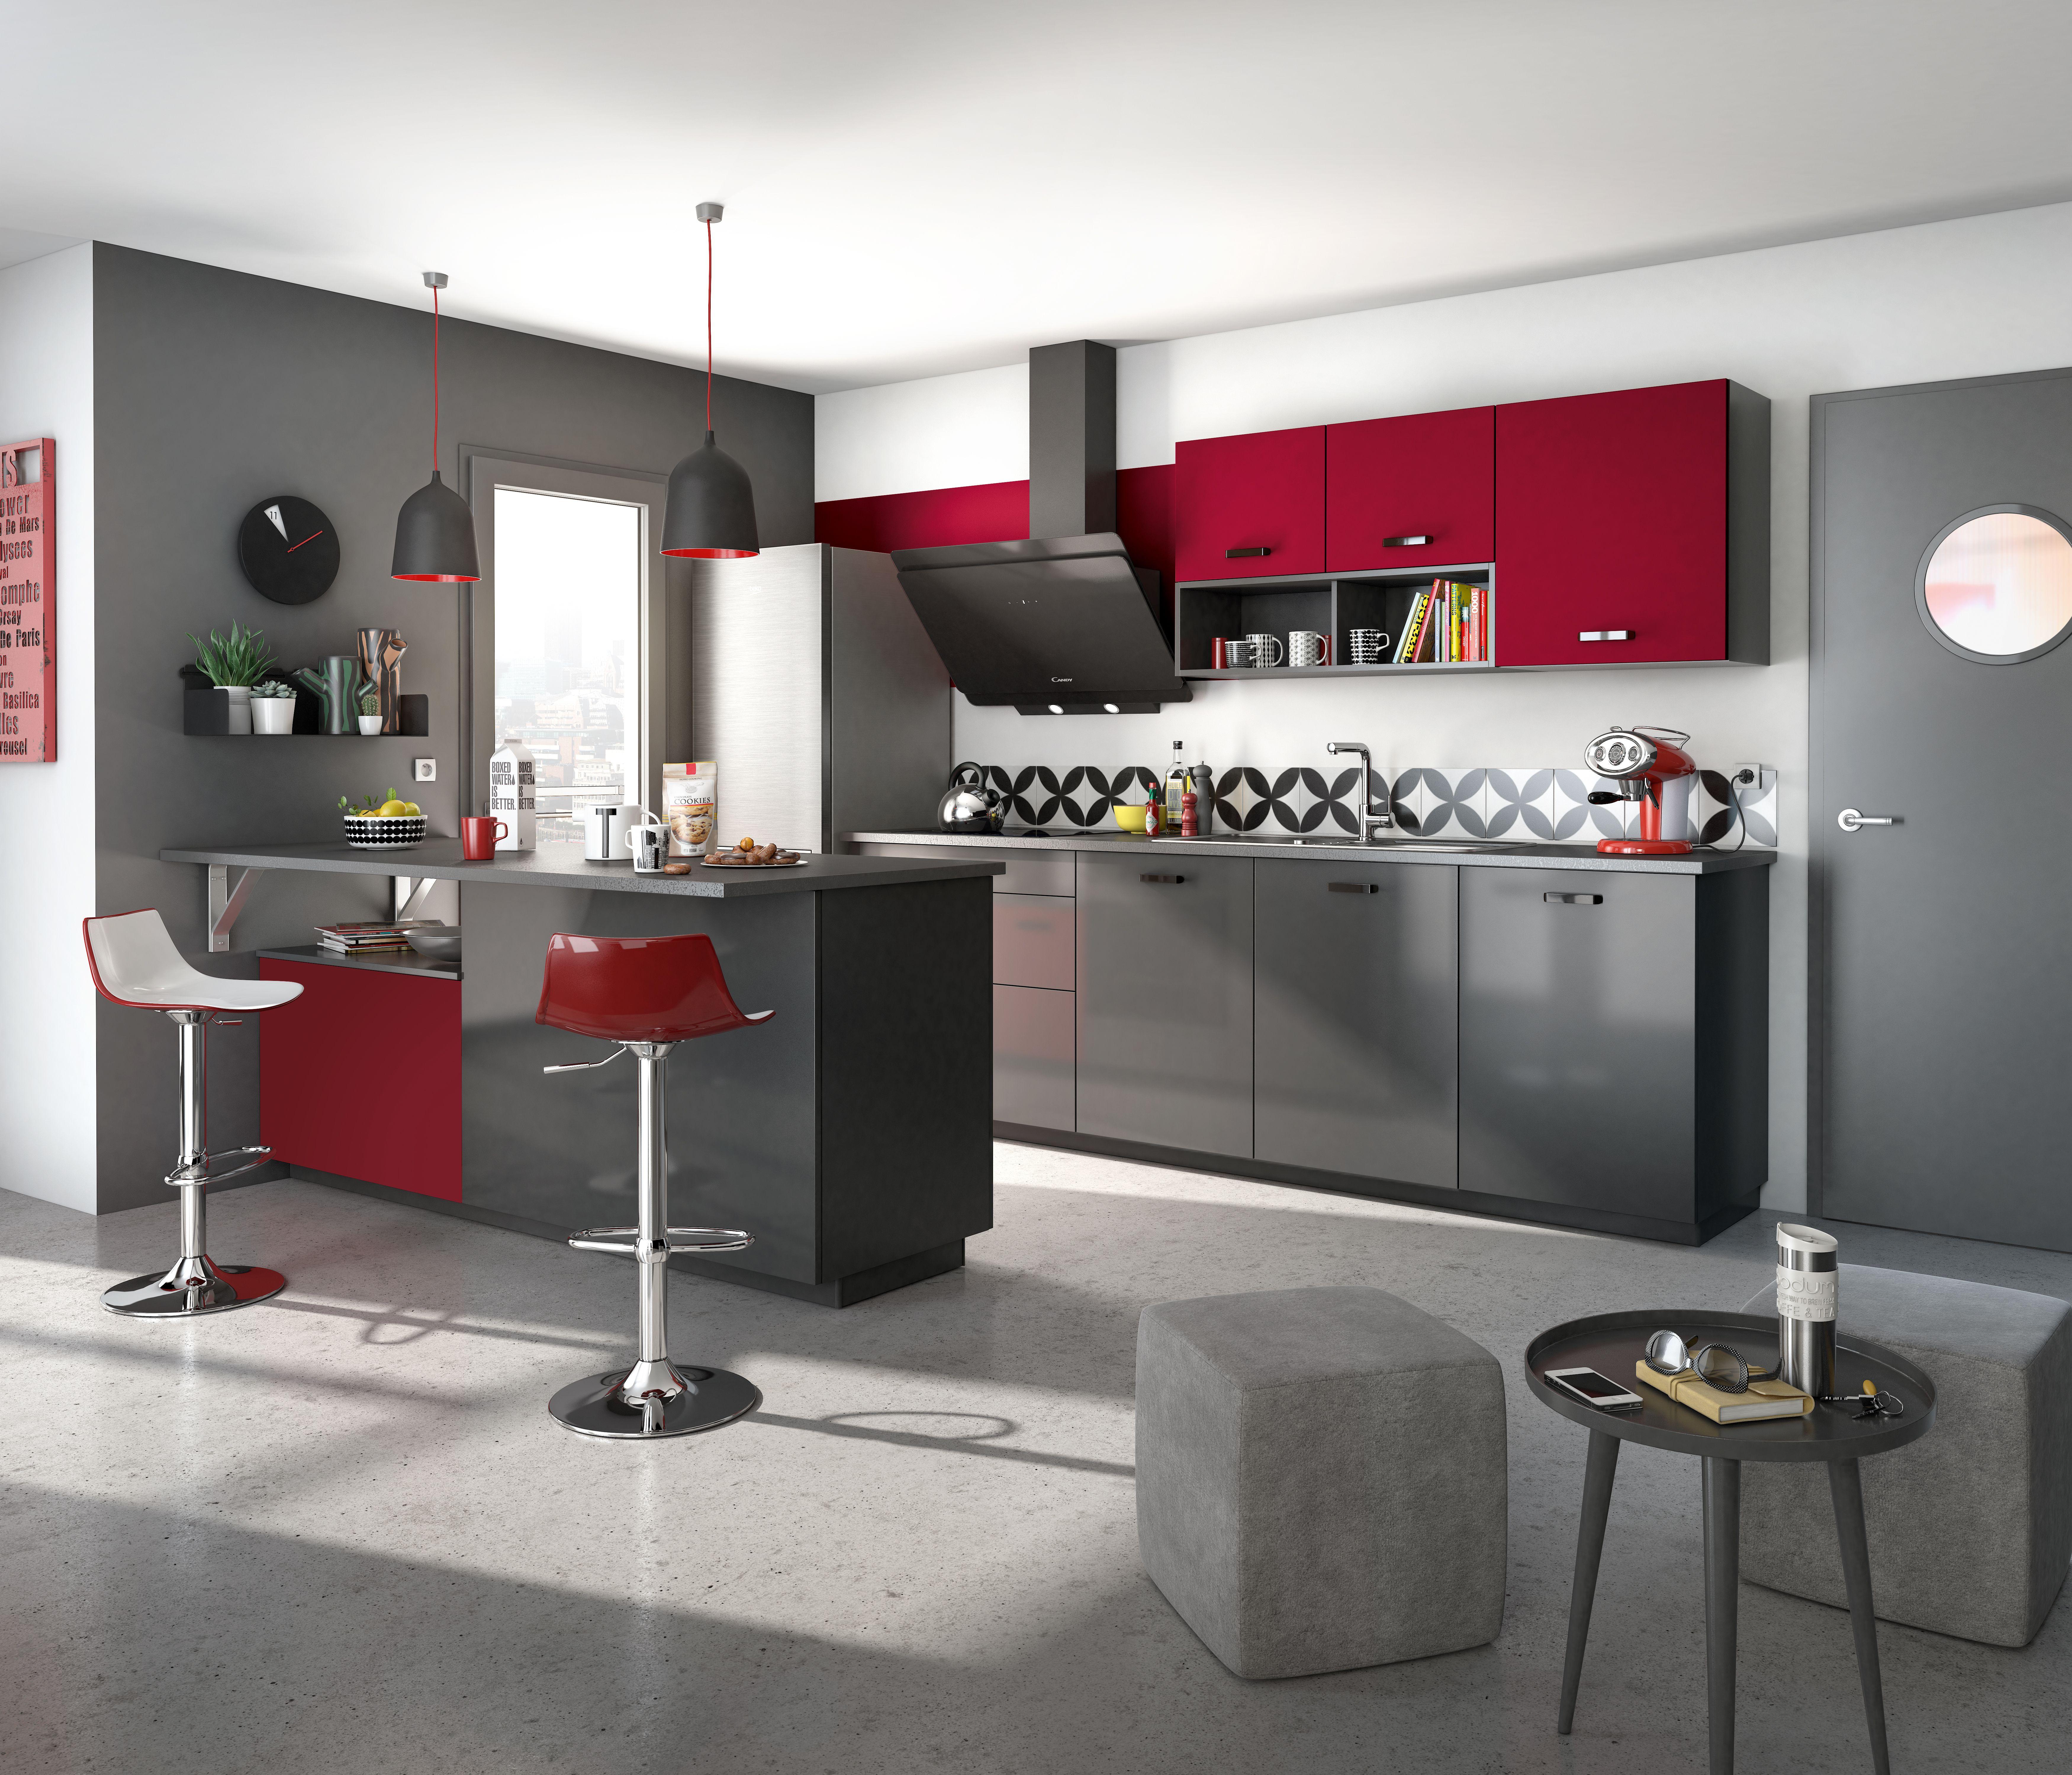 Cuisine Rouge Et Grise Modele De Cuisine Urban Par Socoo C Cuisine Rouge Et Gris Cuisine Ouverte Idee Deco Cuisine